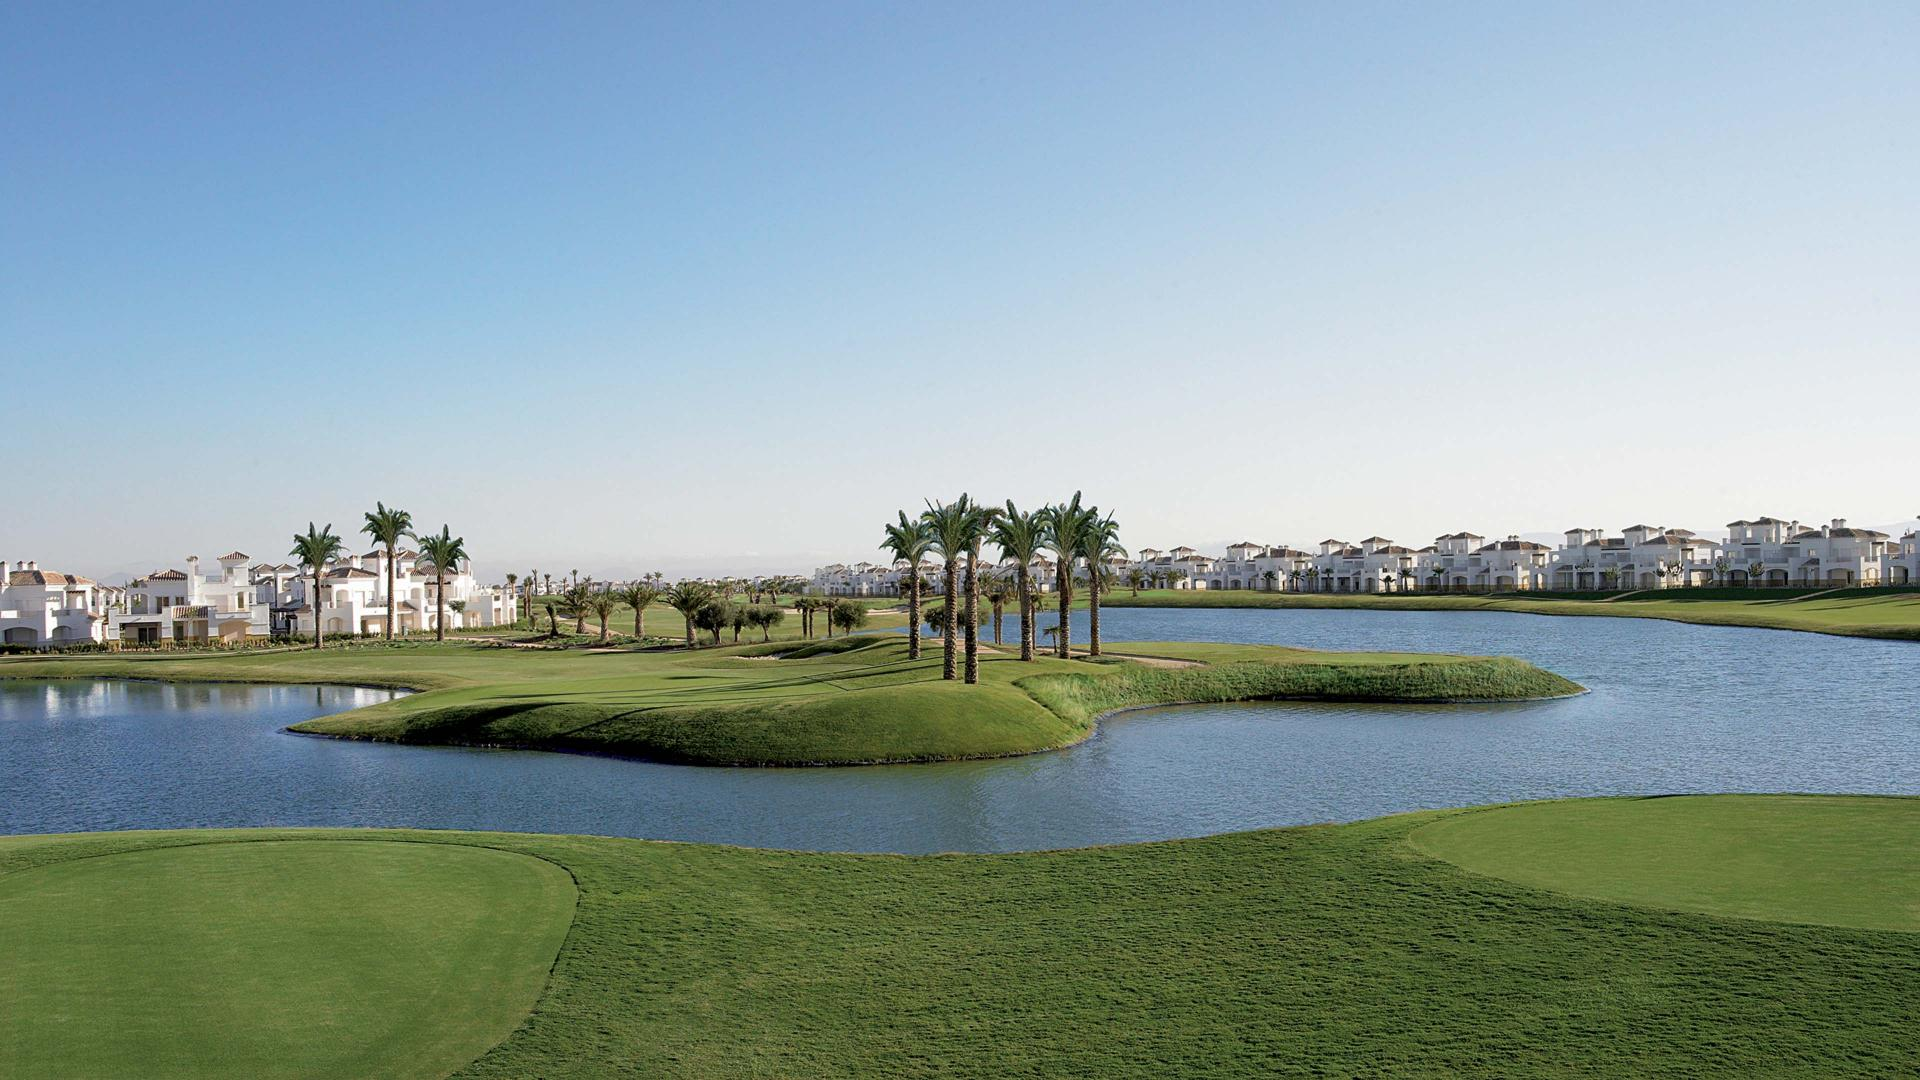 La Torre Golf Resort - Located on the Costa Calida, Murcia, Spain